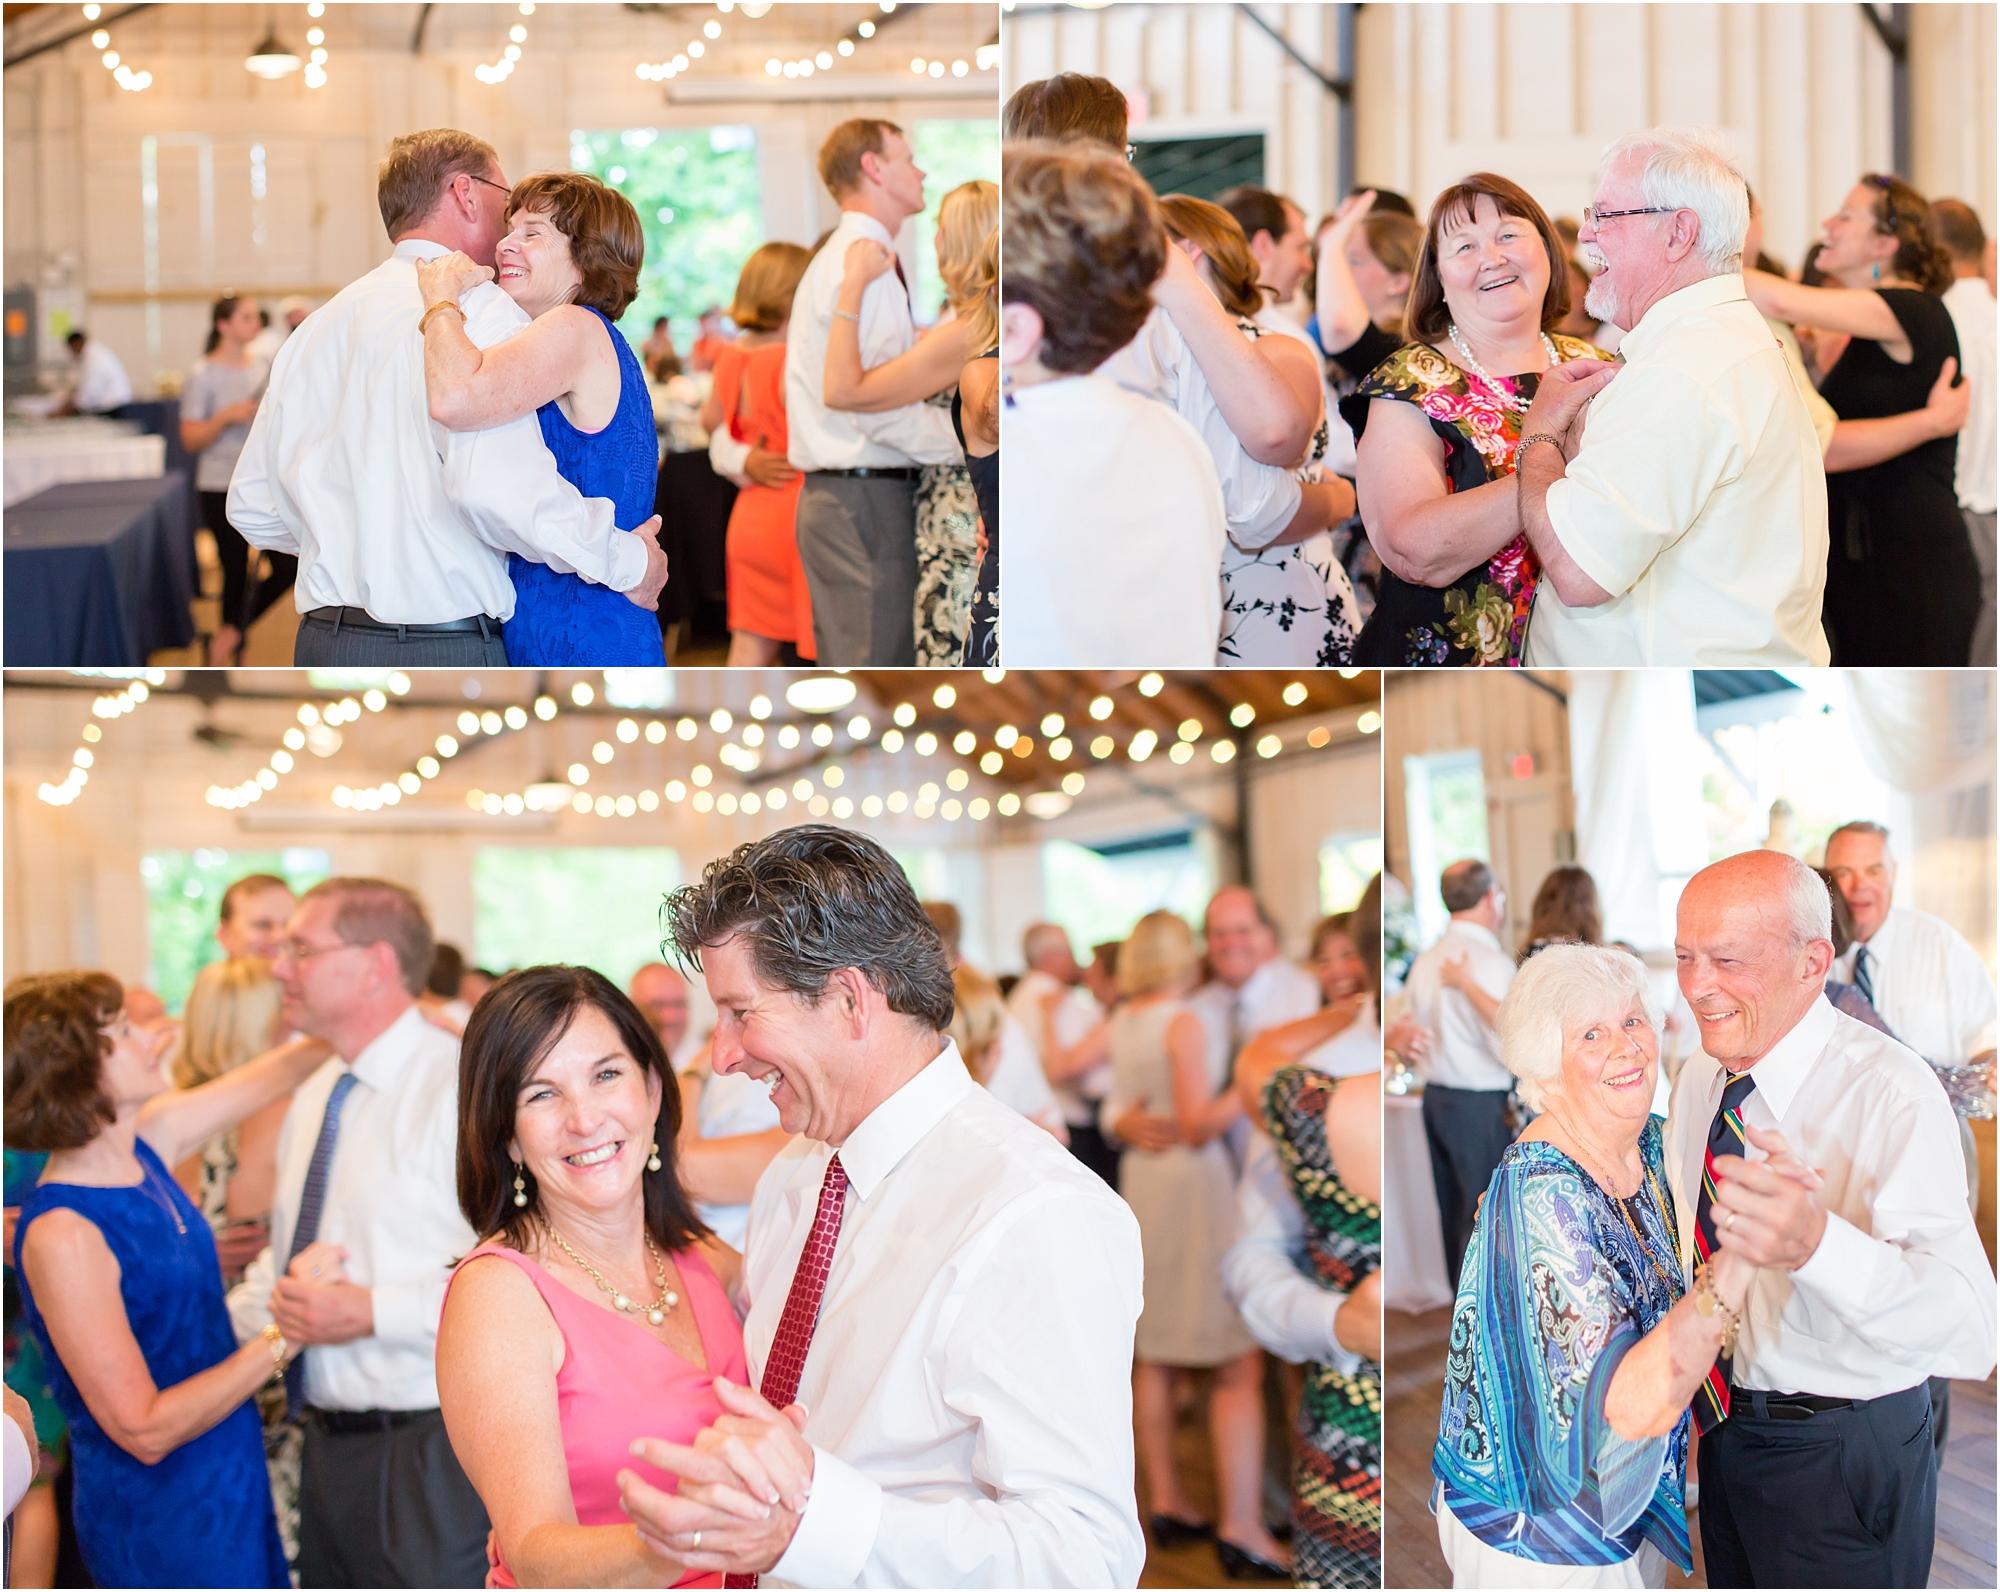 Somerville 6-Reception-465_anna grace photography sherwood forest annapolis maryland wedding photographer photo.jpg